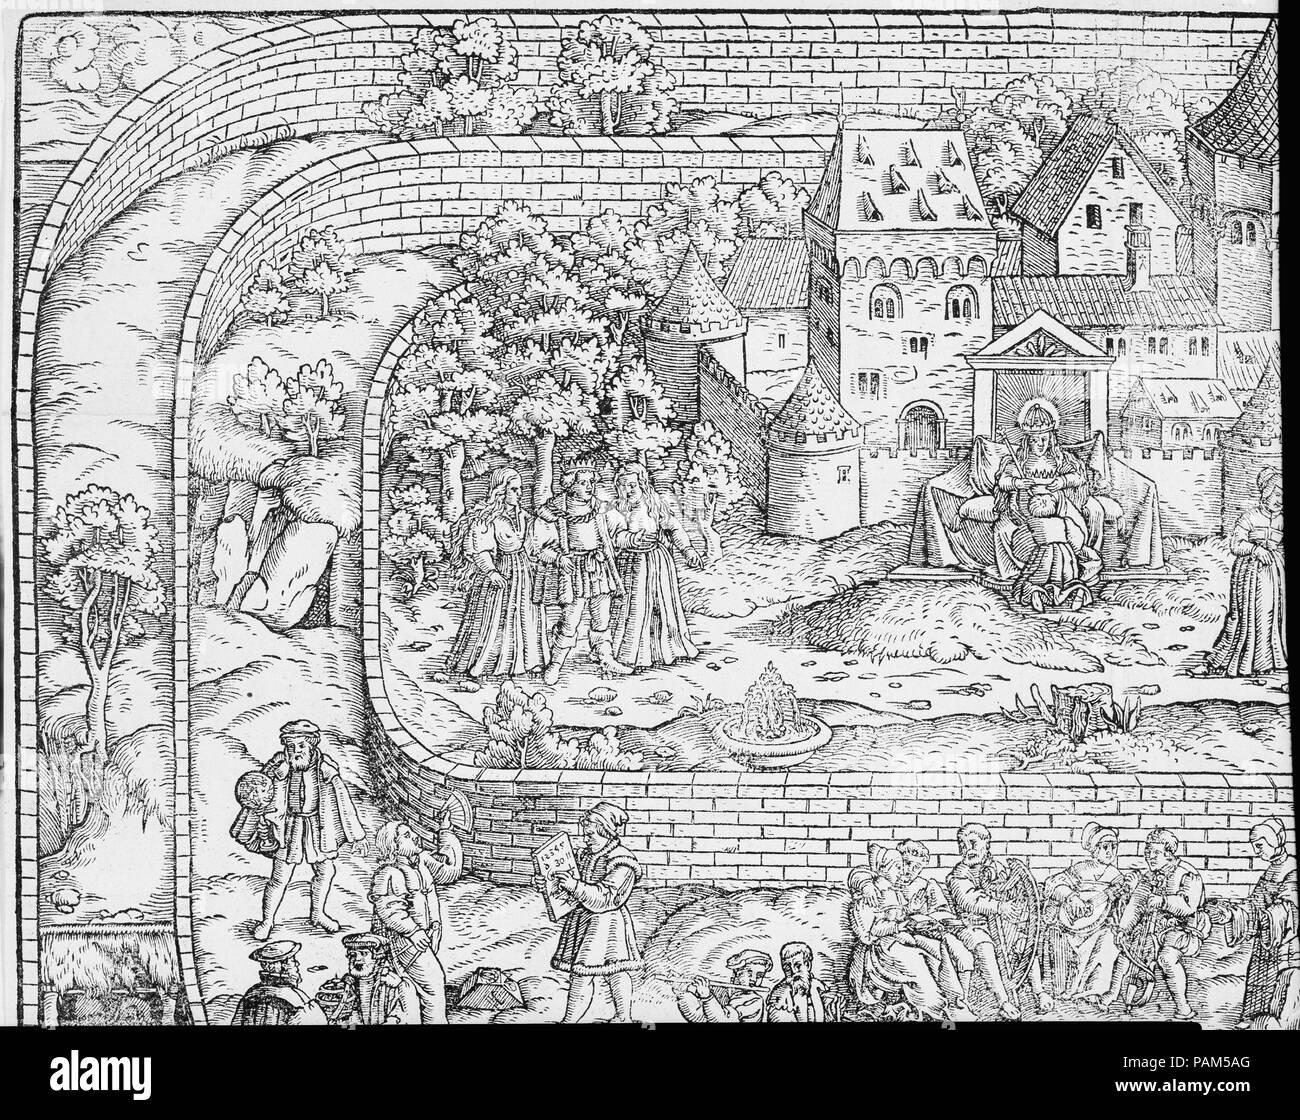 16th Century Mathematics Imágenes De Stock & 16th Century ...